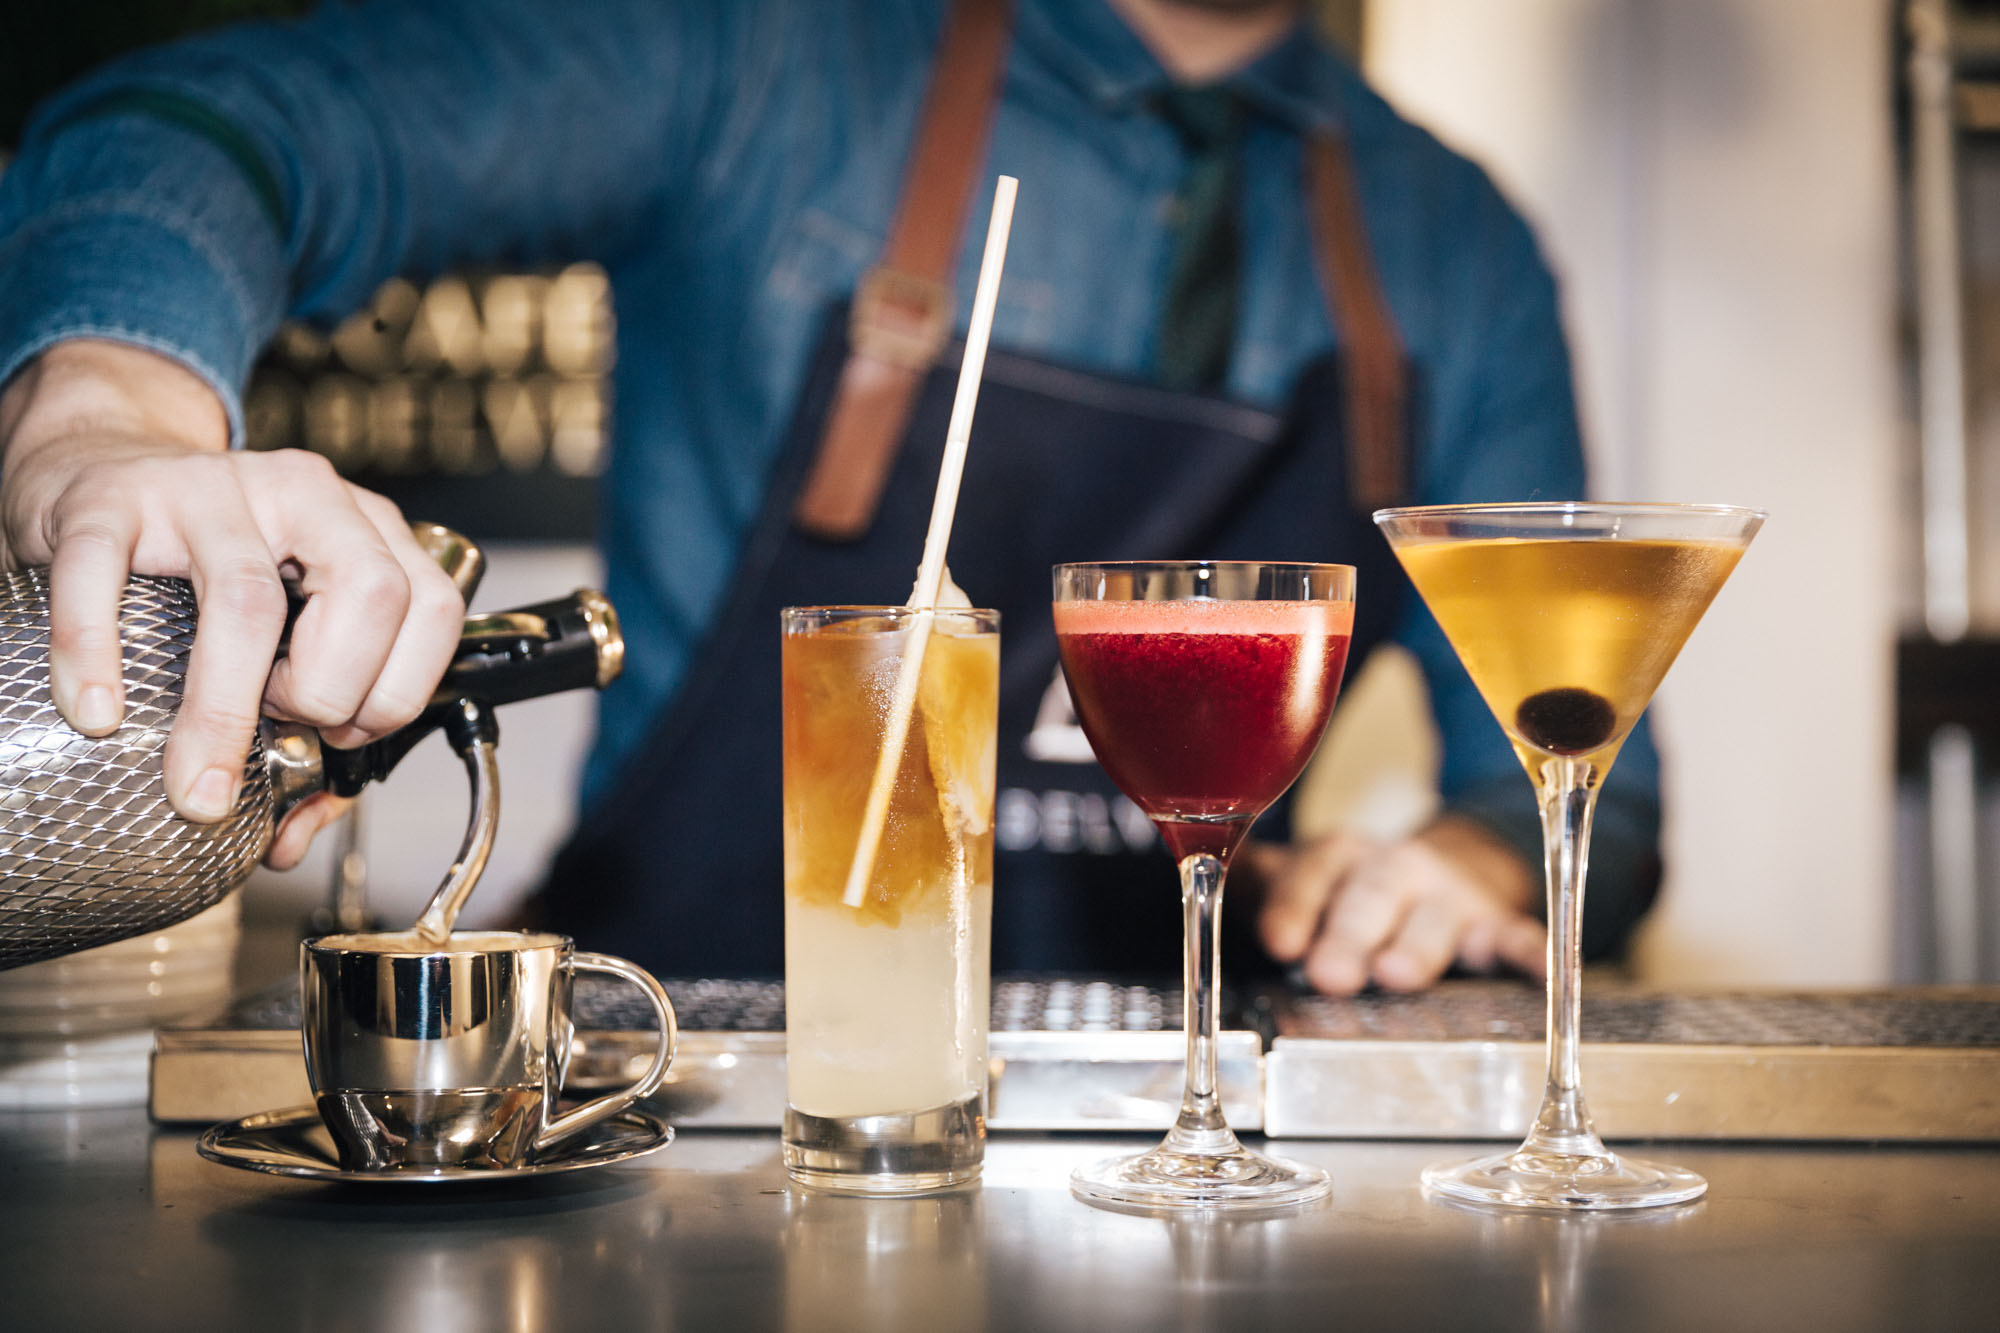 Belvedere Vodka Announces An Espresso Martini Pop-up At The Citizen photo